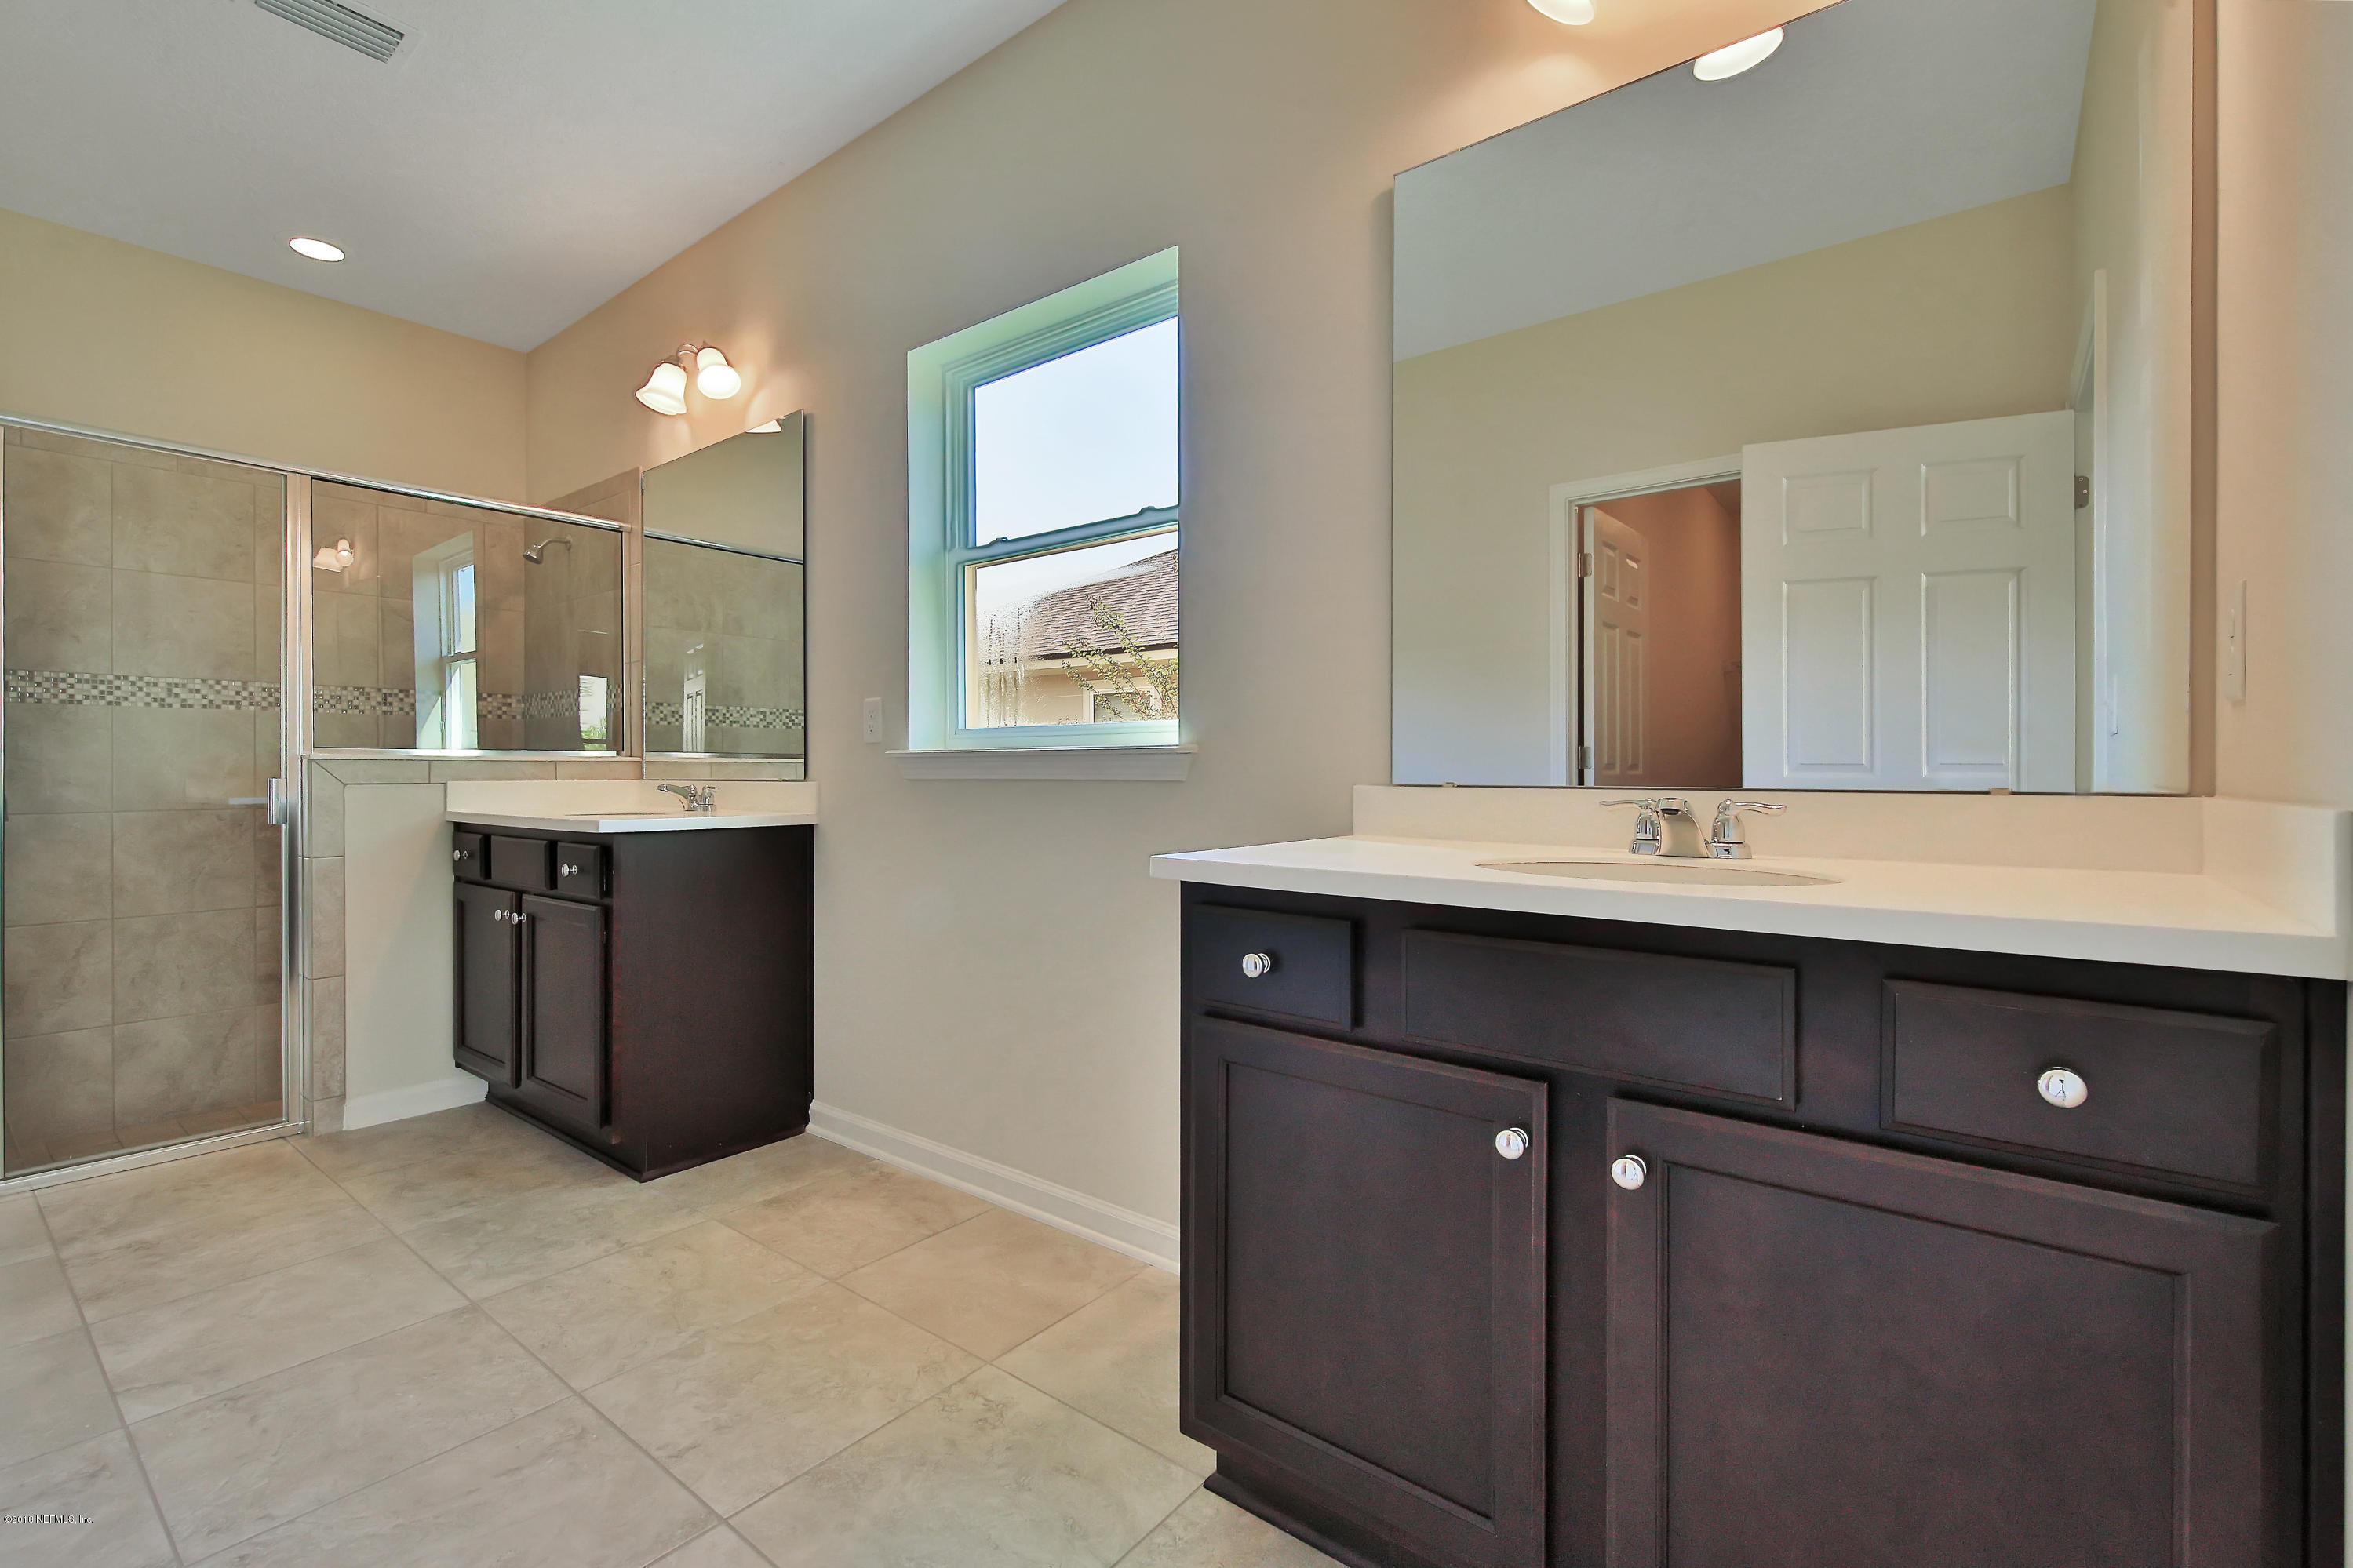 10858 STANTON HILLS, JACKSONVILLE, FLORIDA 32222, 3 Bedrooms Bedrooms, ,2 BathroomsBathrooms,Residential - single family,For sale,STANTON HILLS,939809